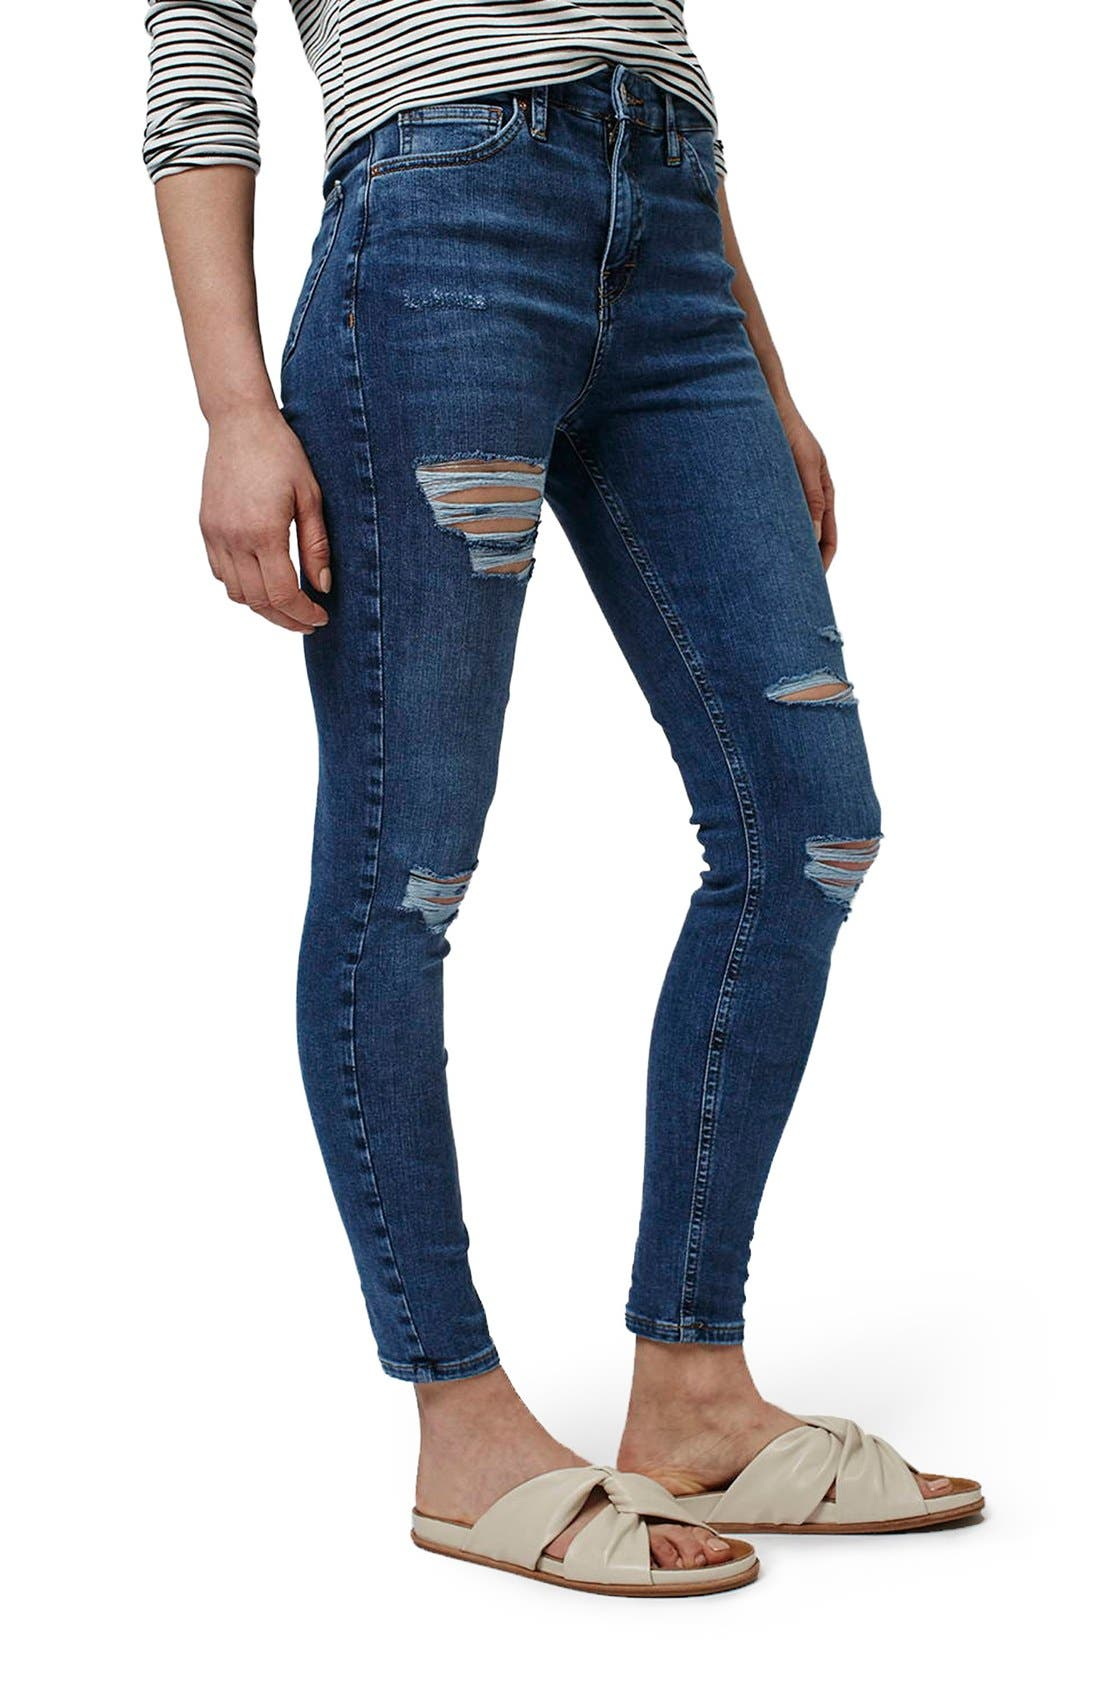 Alternate Image 1 Selected - Topshop Moto 'Jamie' Super Ripped Skinny Jeans